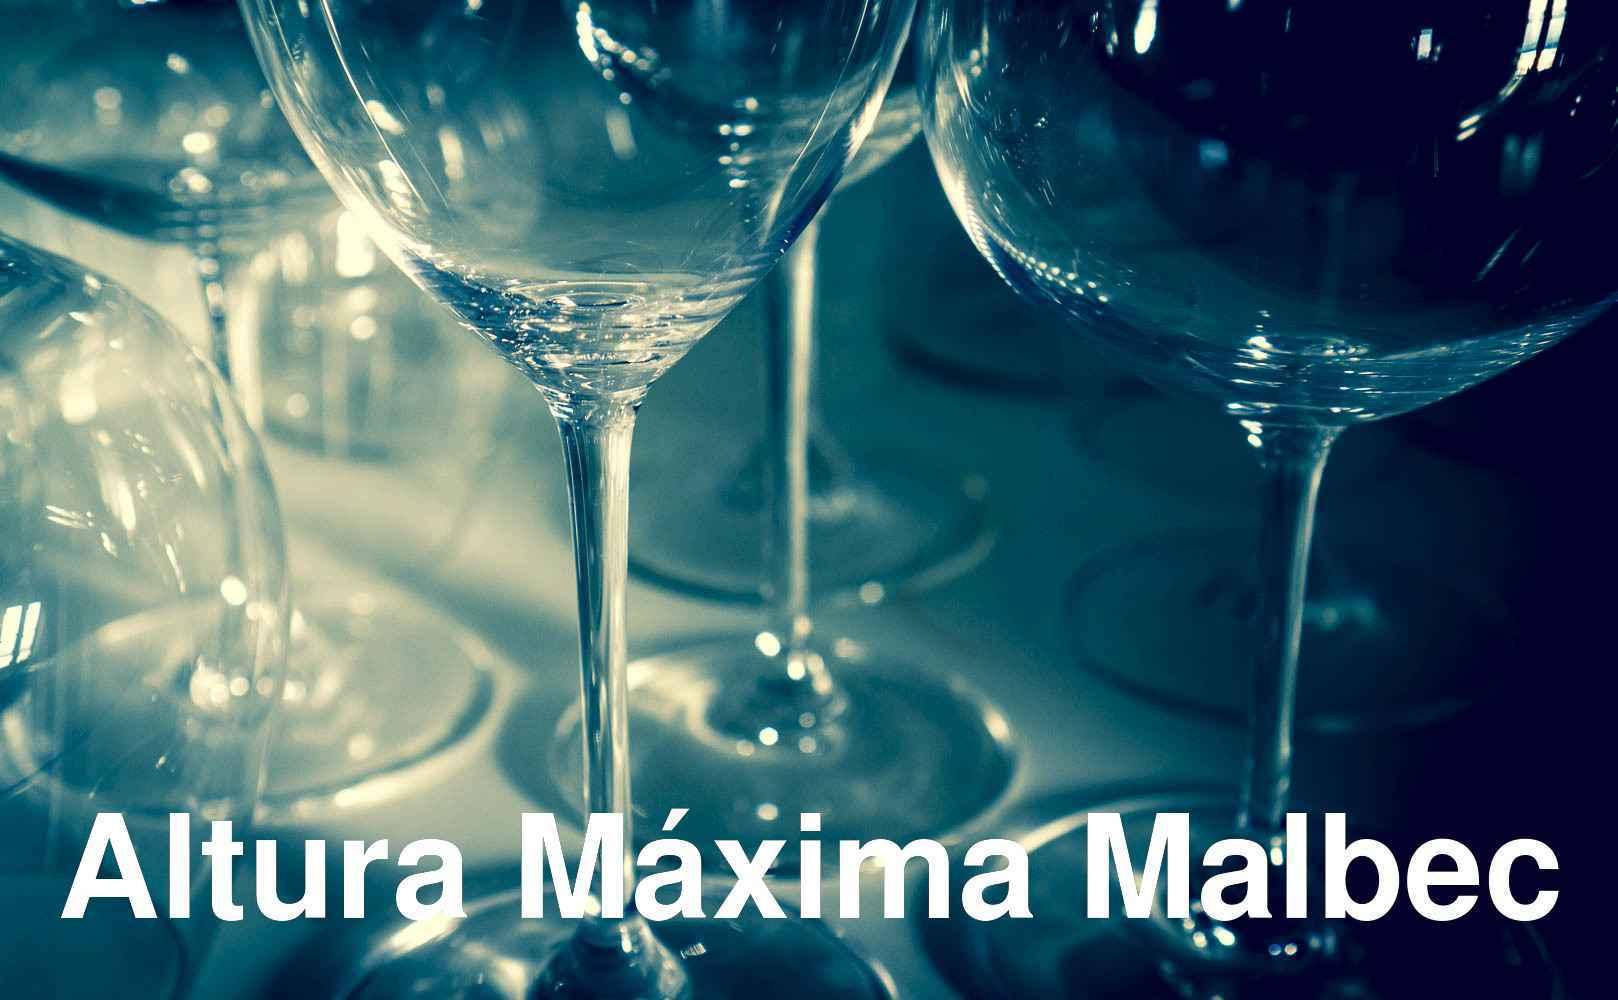 Go to Altura Máxima Malbec von Bodega Colomé aus Valle Calchaquí, Argentinien